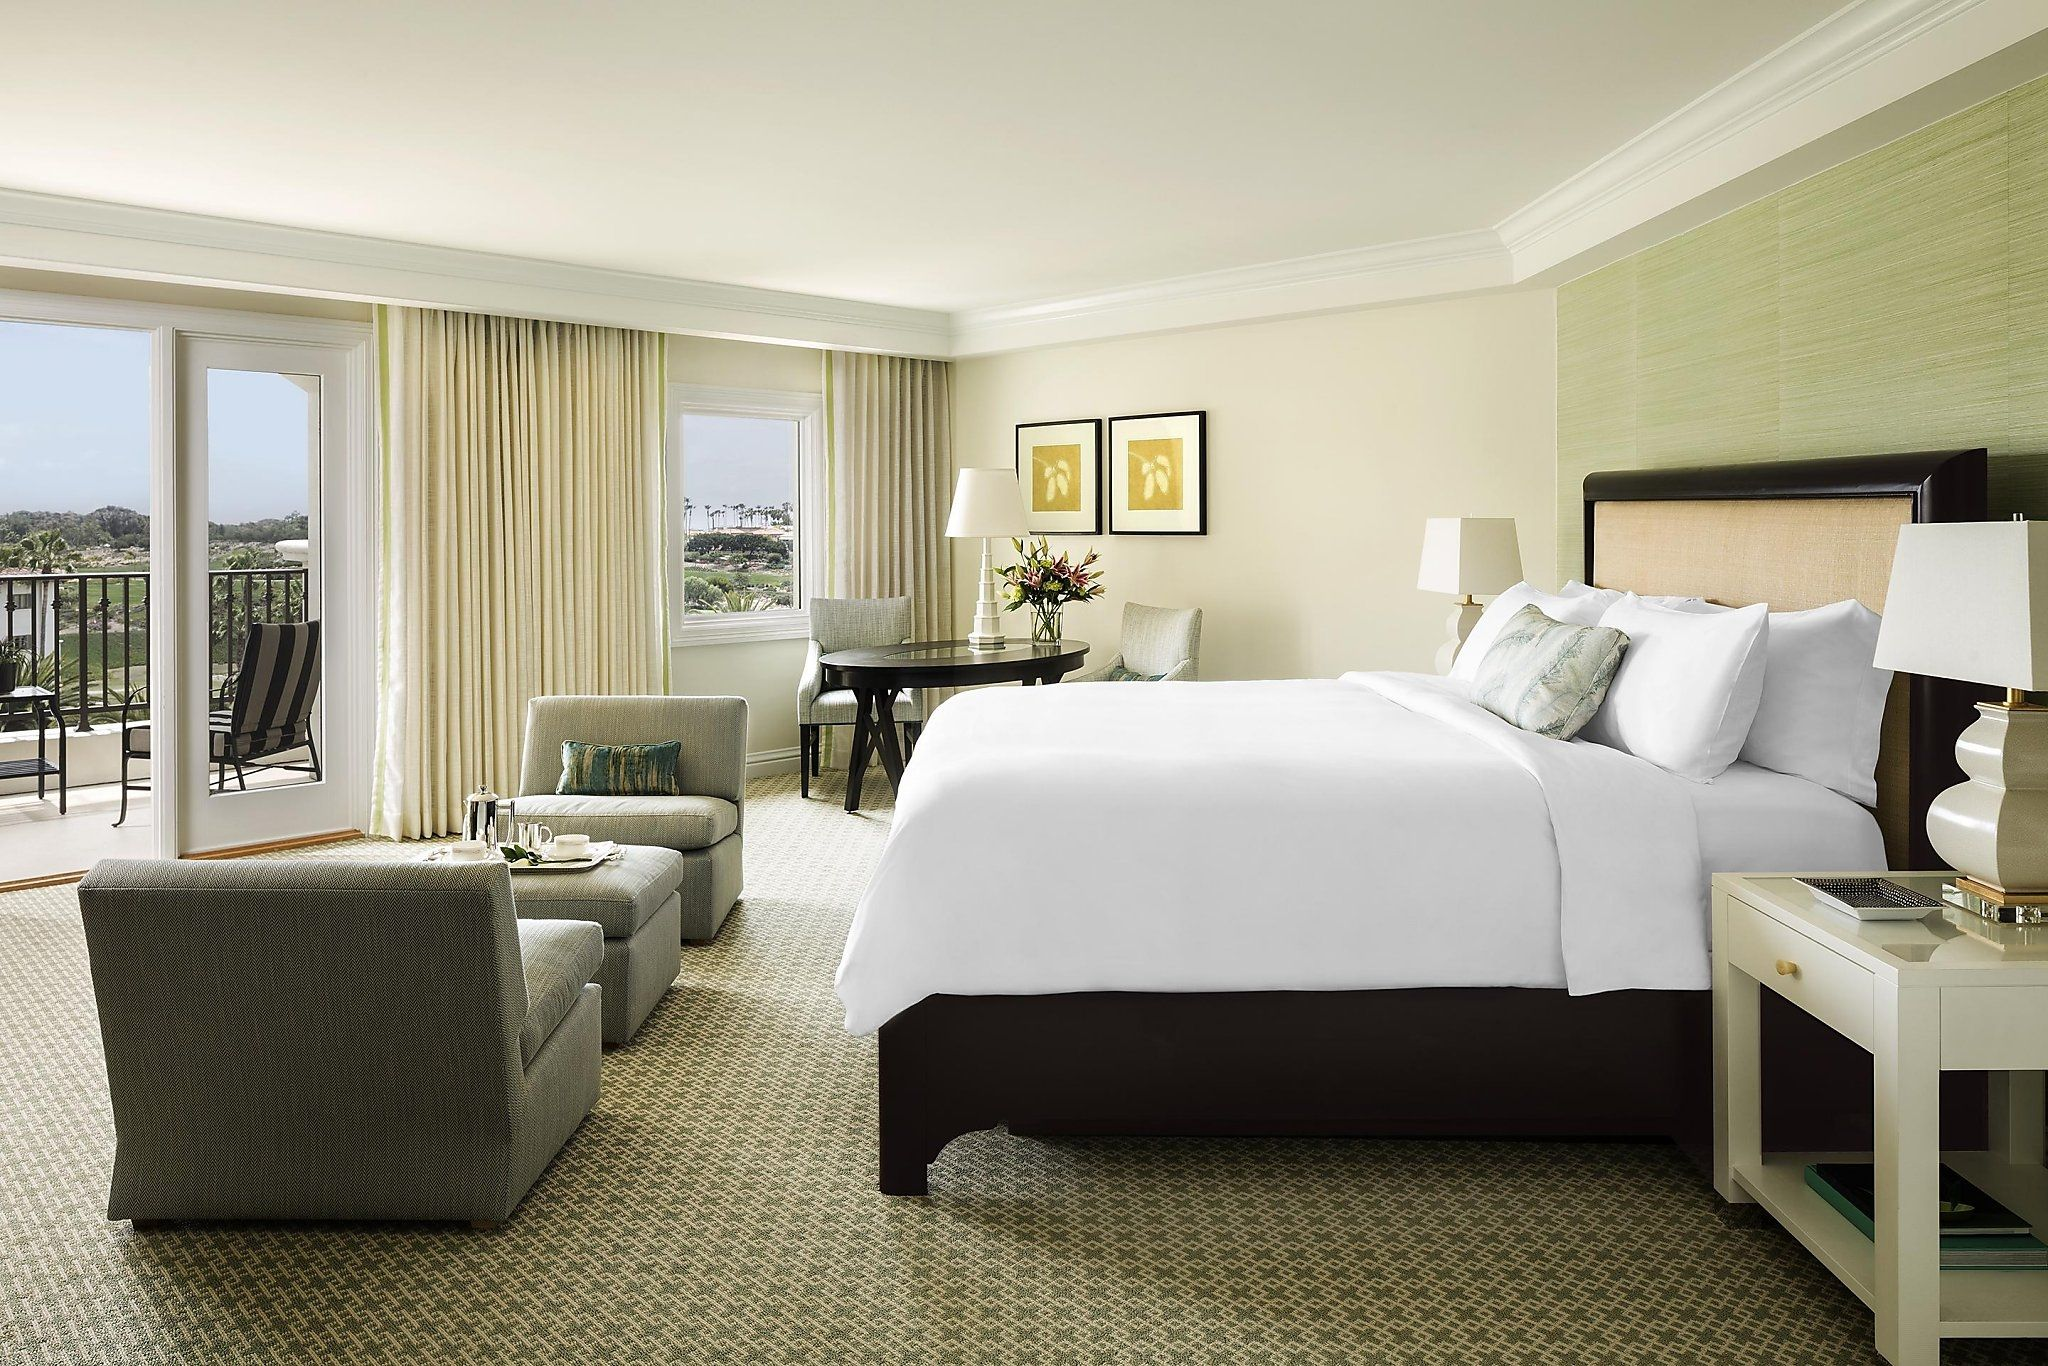 Bedroom Furniture Spot furniture spot bedroom suites | bedroom furniture | pinterest